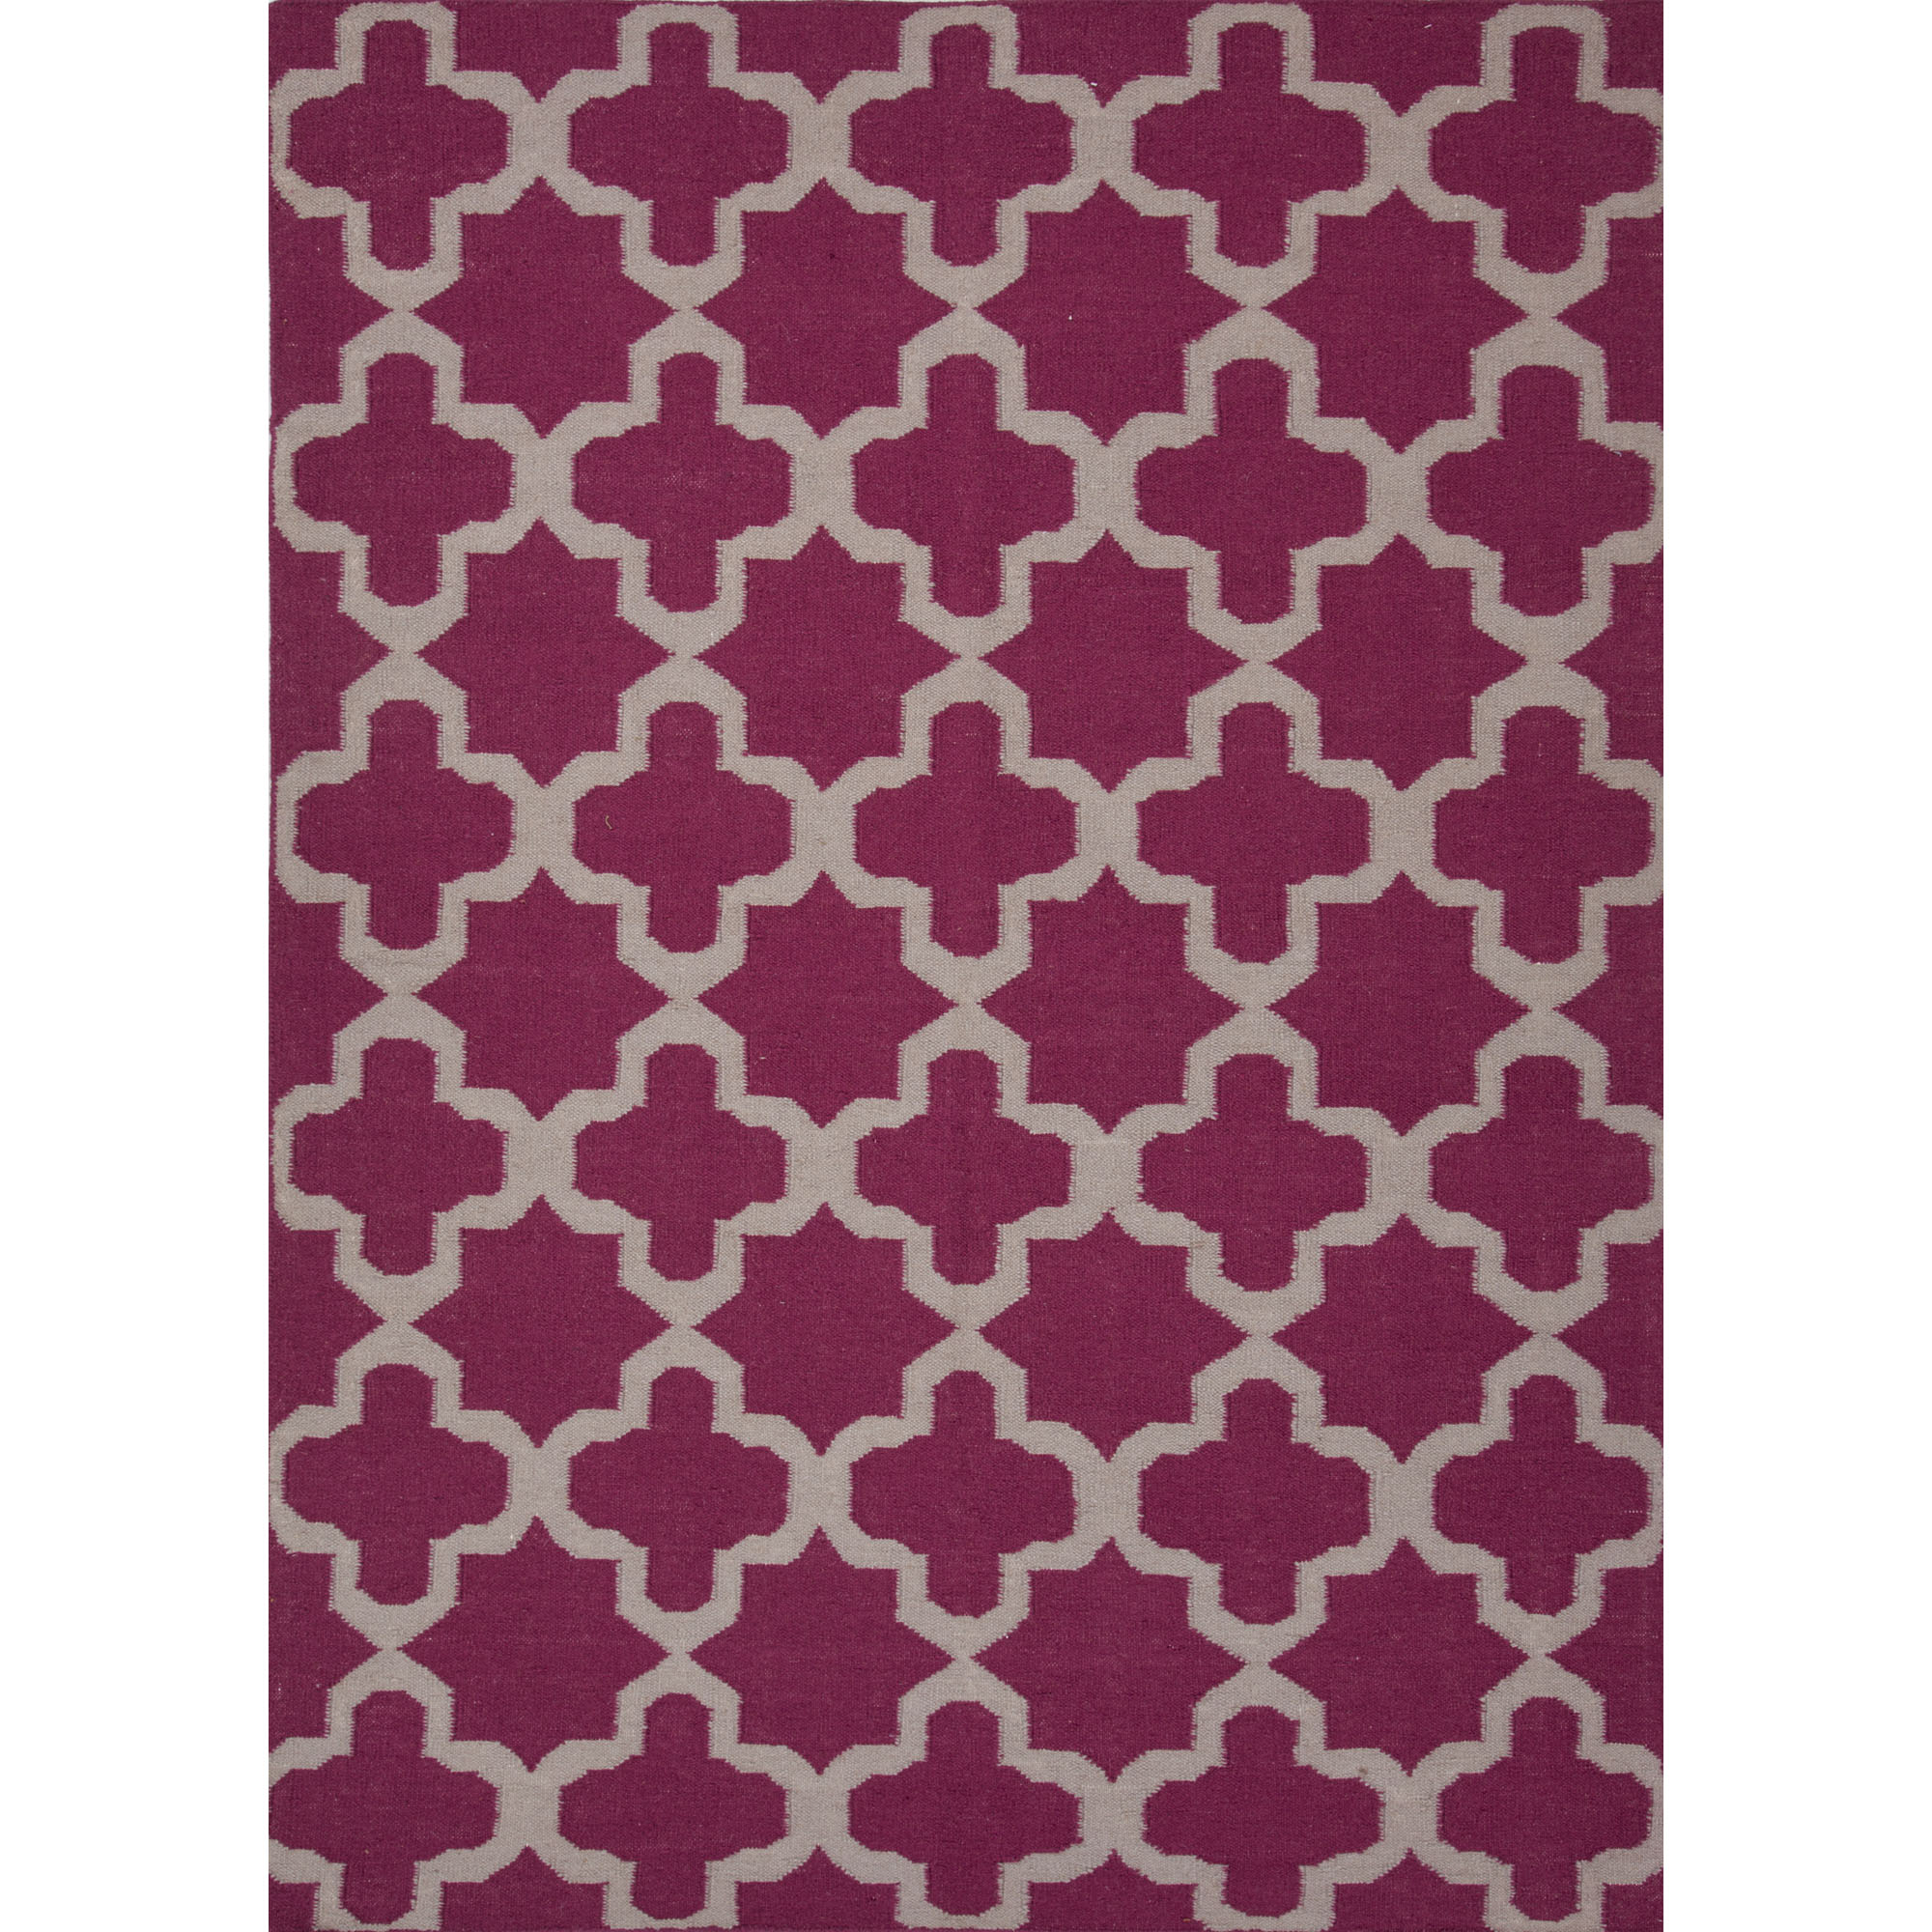 JAIPUR Rugs Maroc 5 x 8 Rug - Item Number: RUG102860